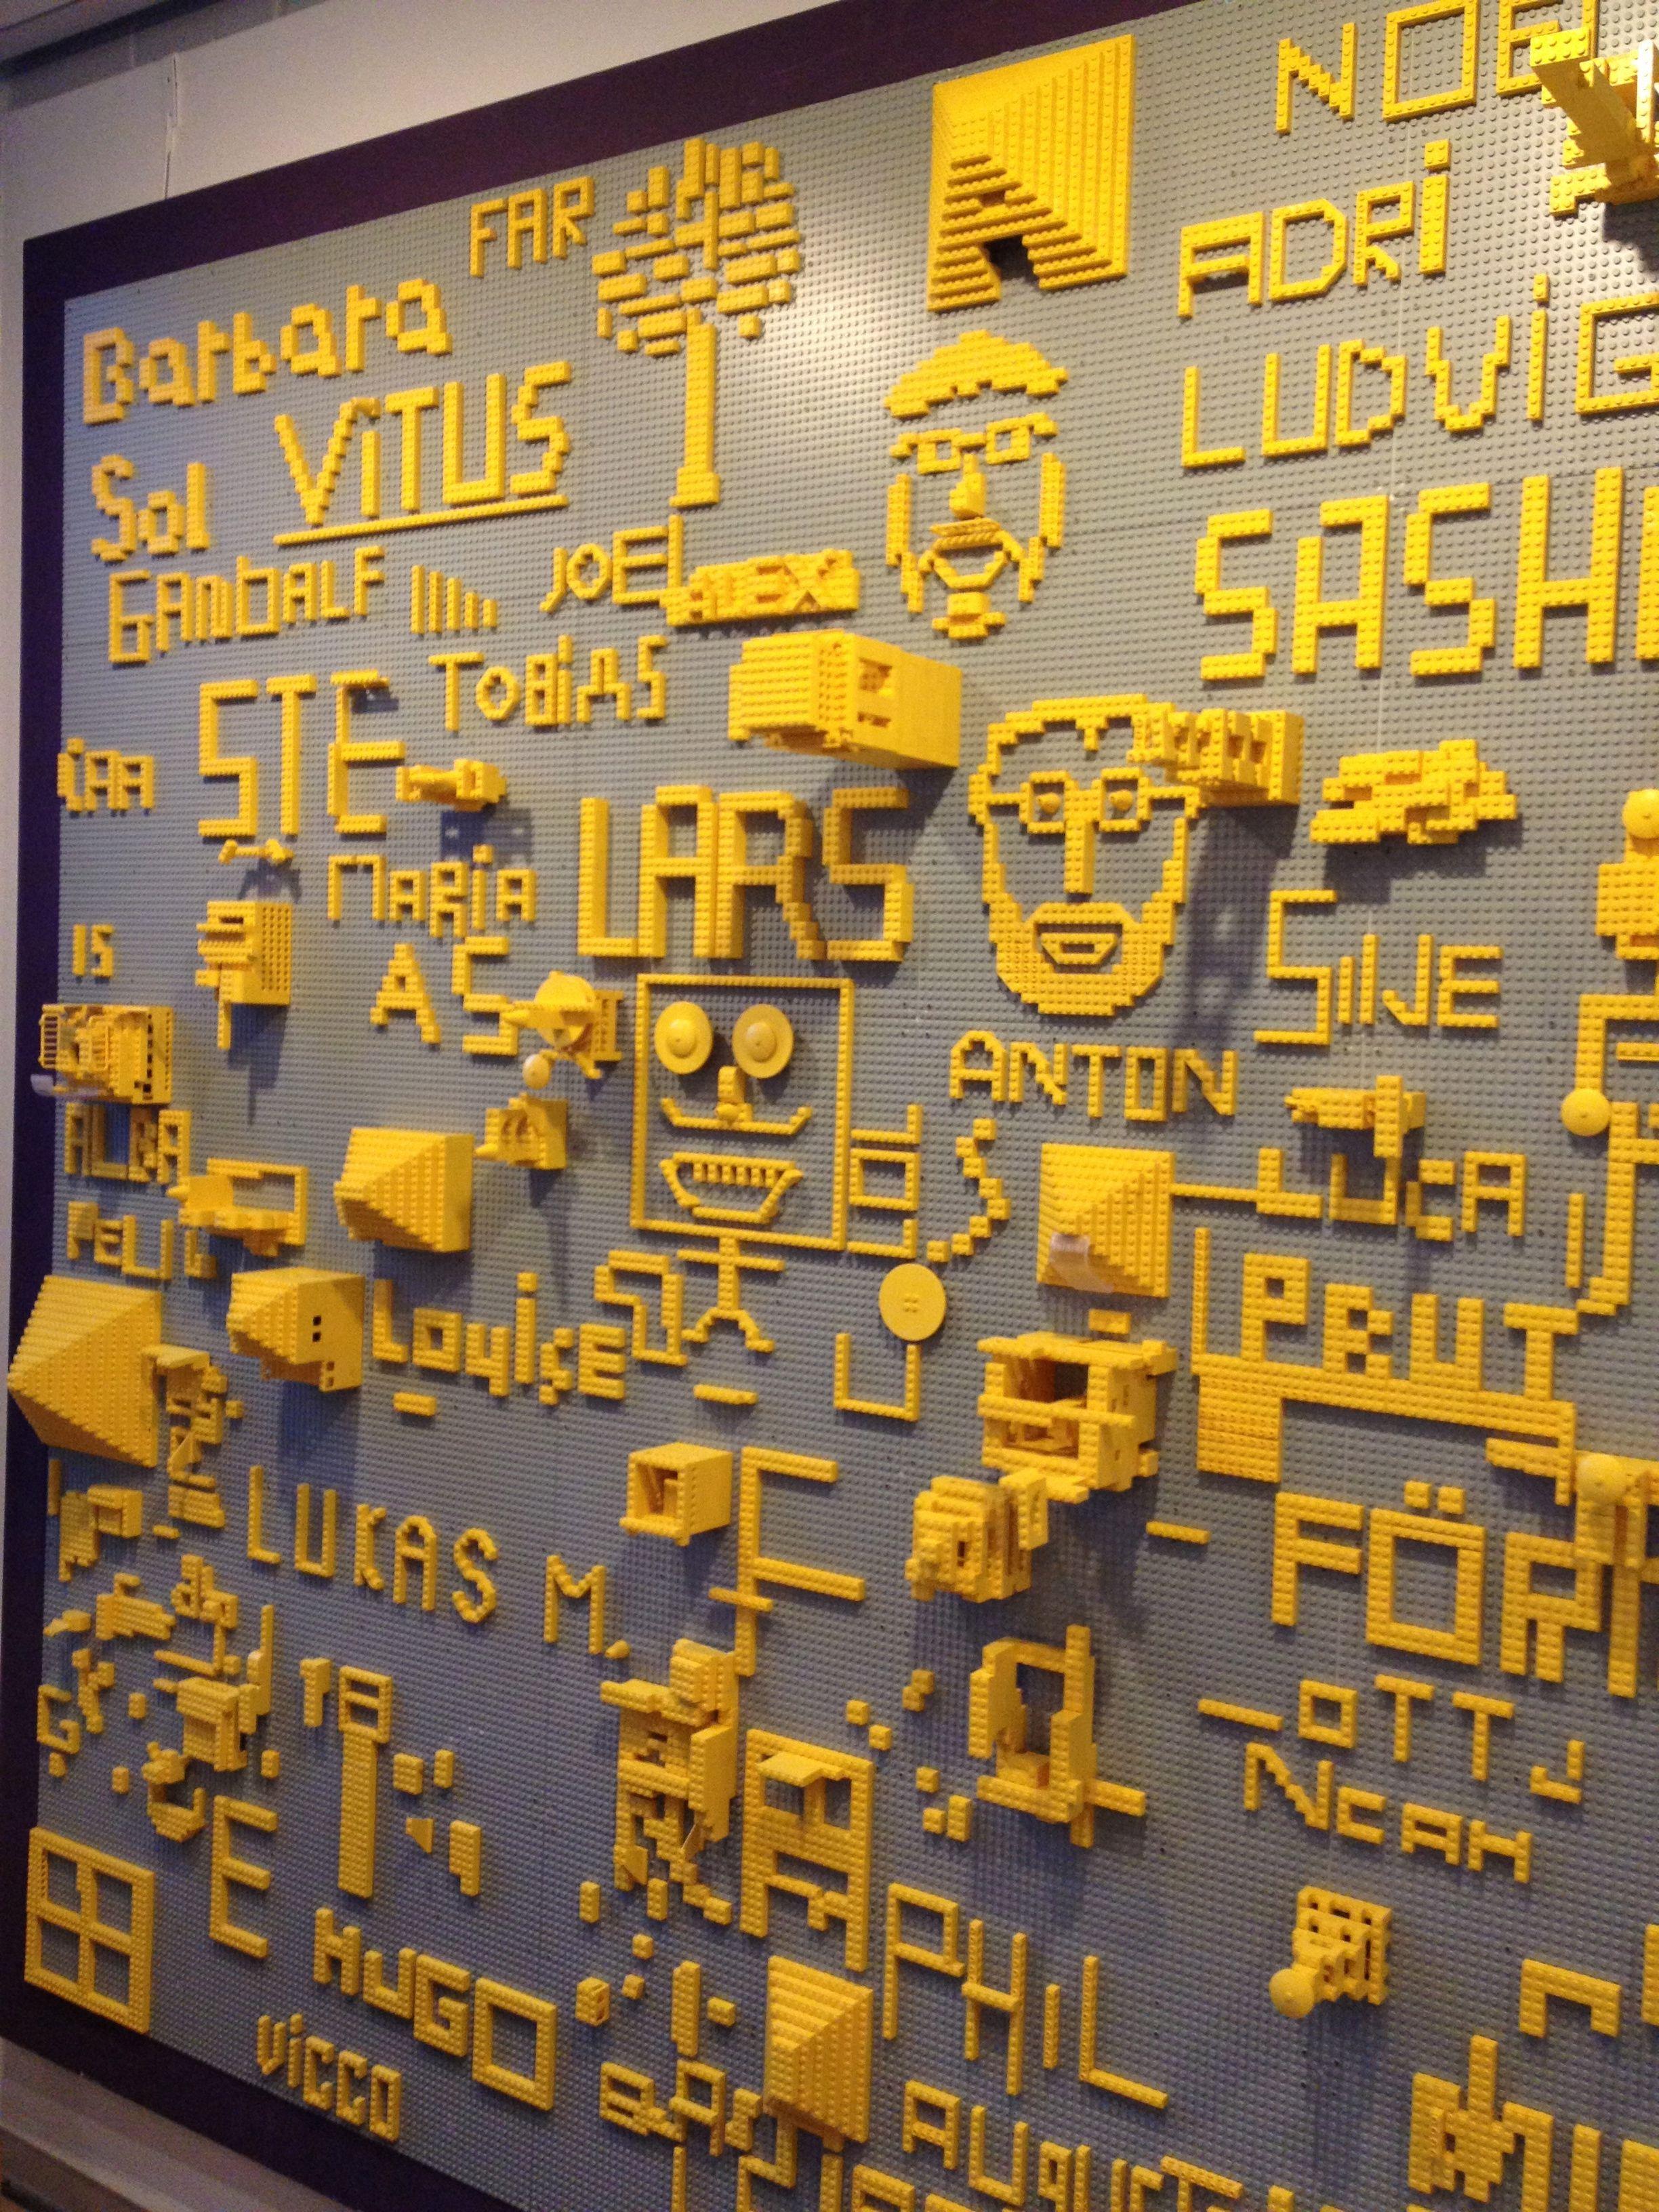 Lego Wall Louisiana Museum Of Modern Art Denmark Lego